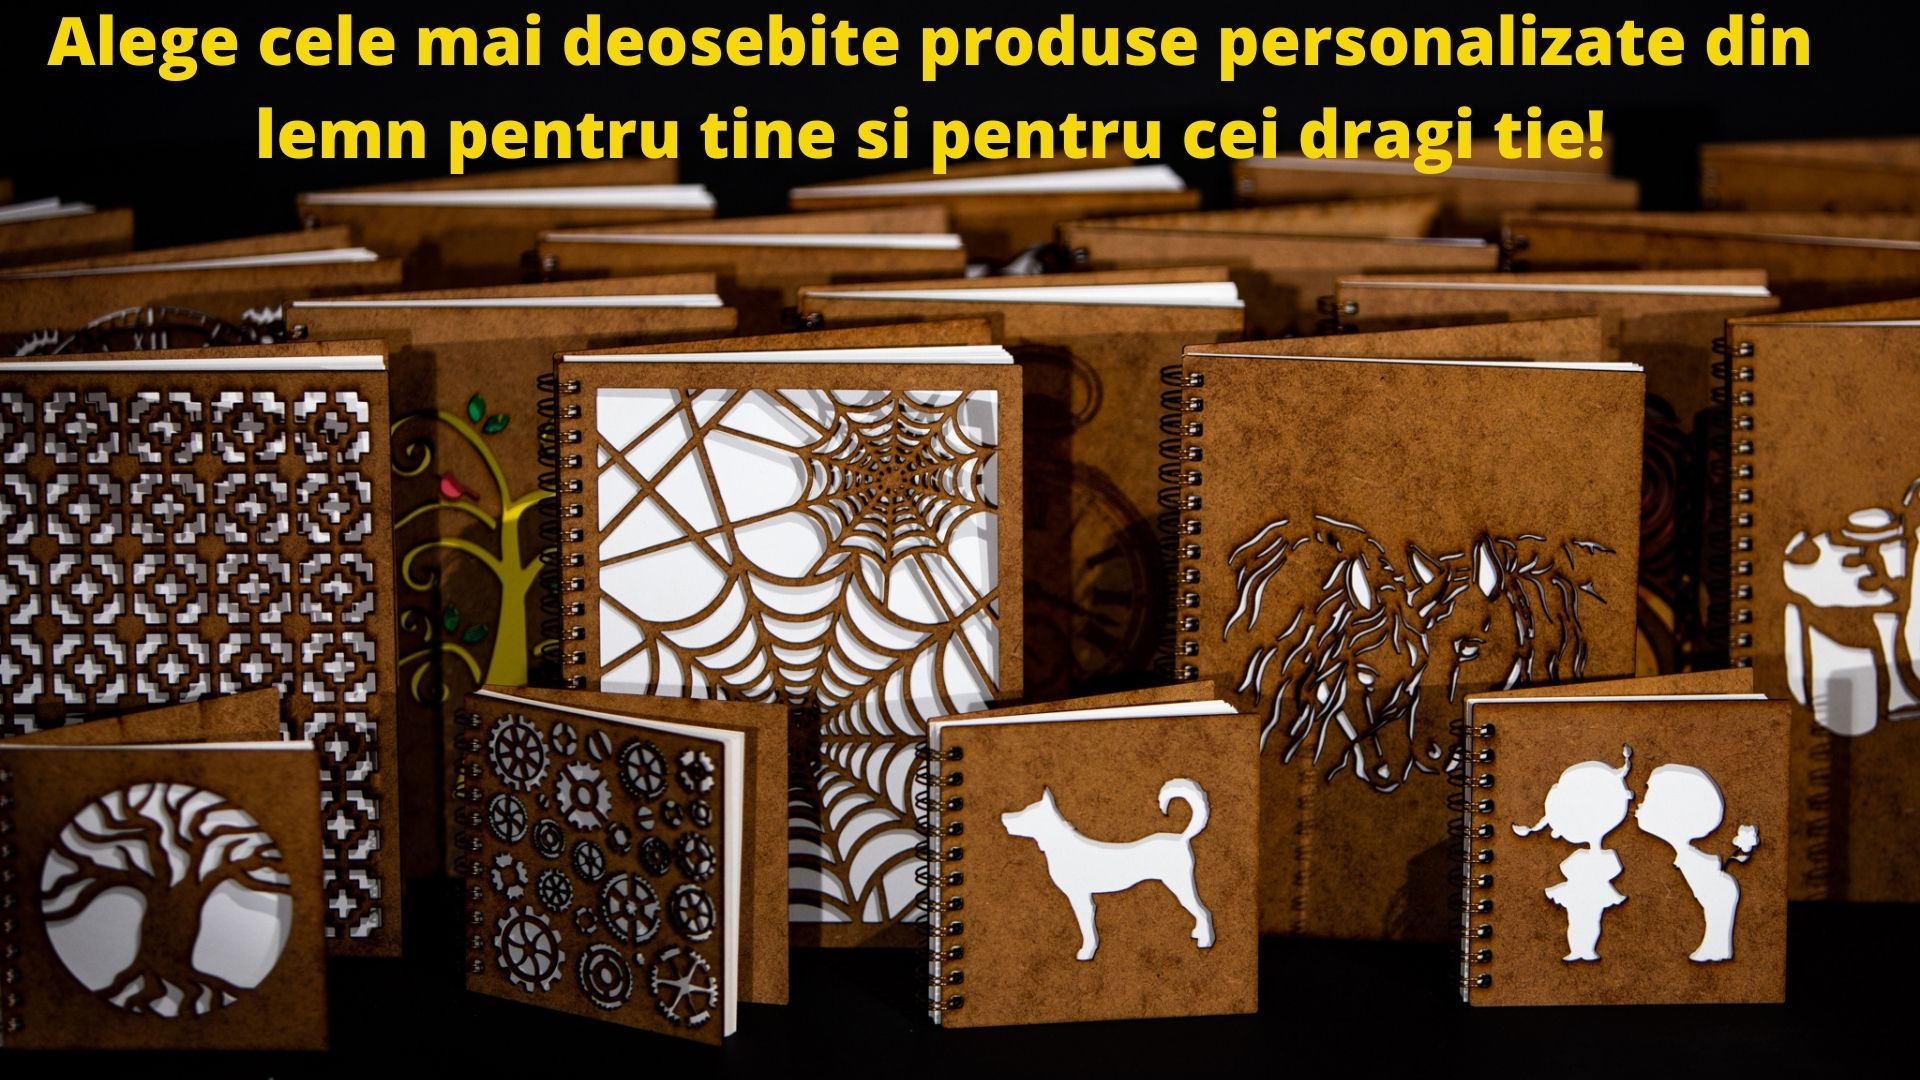 Cadouri inedite si originale din lemn personalizate